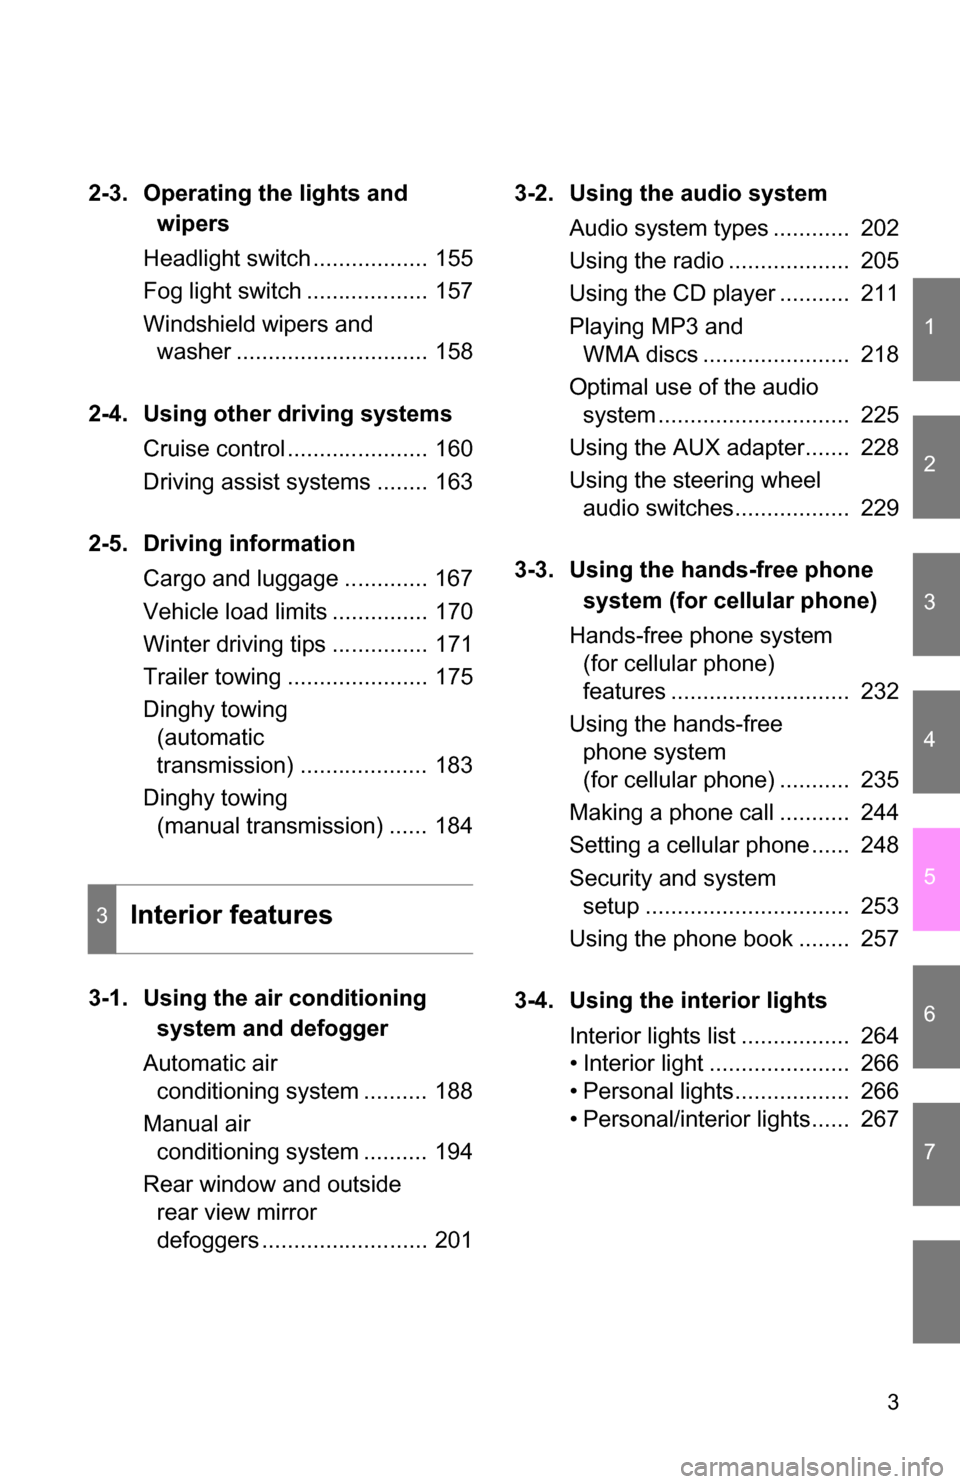 toyota corolla 2010 10 g owners manual rh carmanualsonline info toyota corolla 2010 service manual pdf toyota corolla 2010 user manual pdf